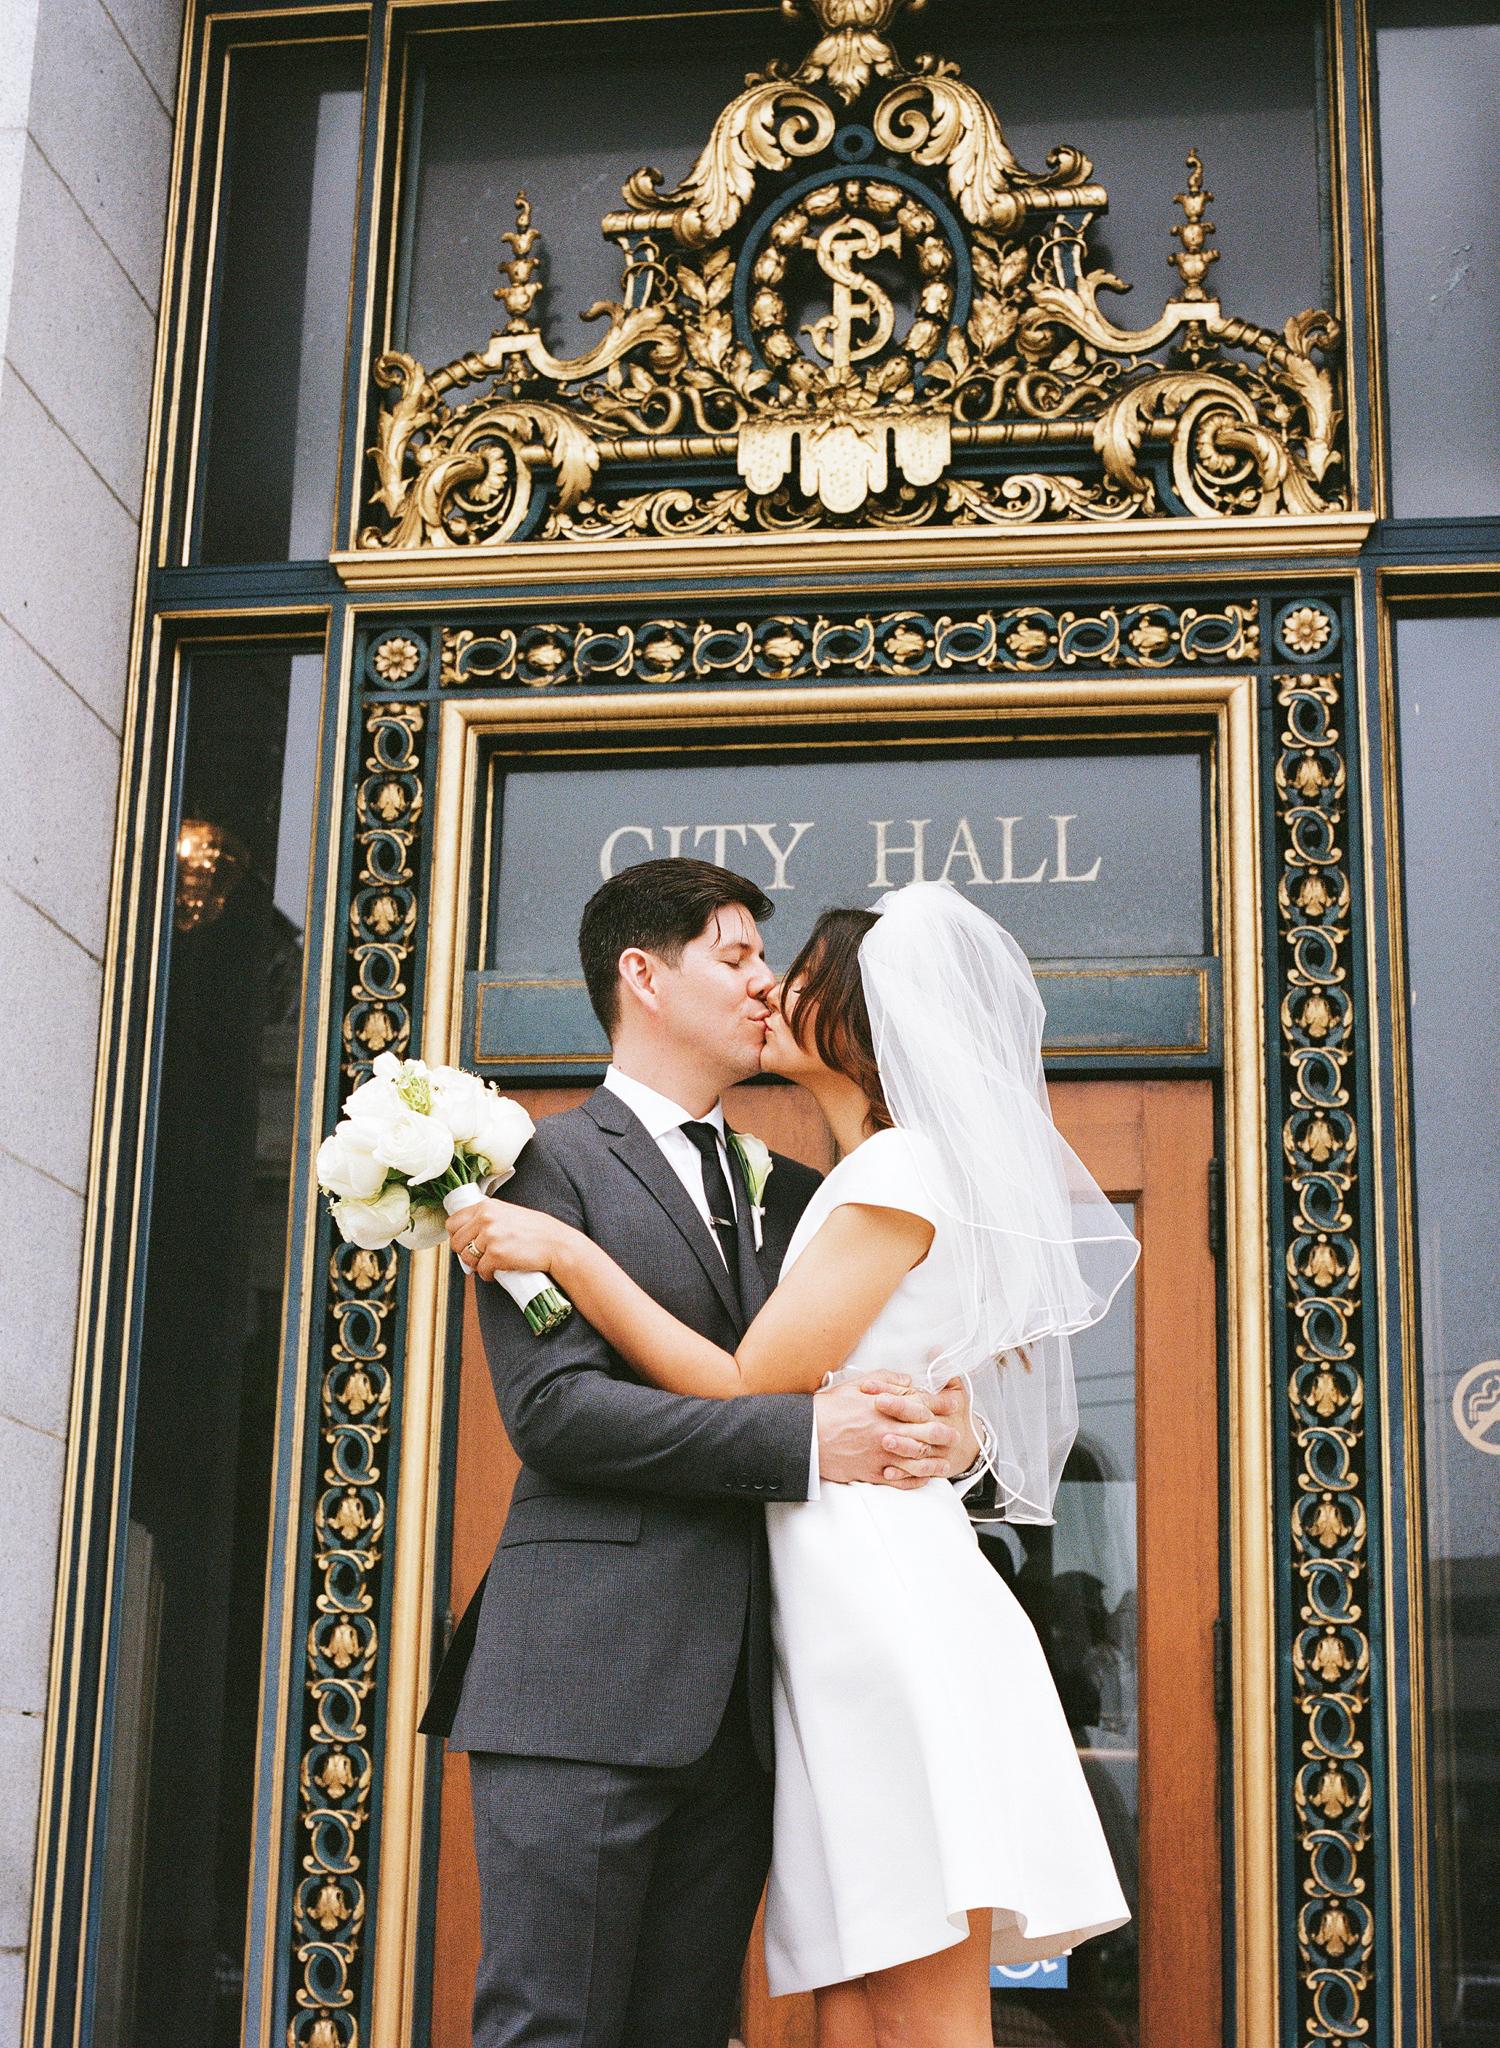 28-city-hall-wedding-sf.jpg